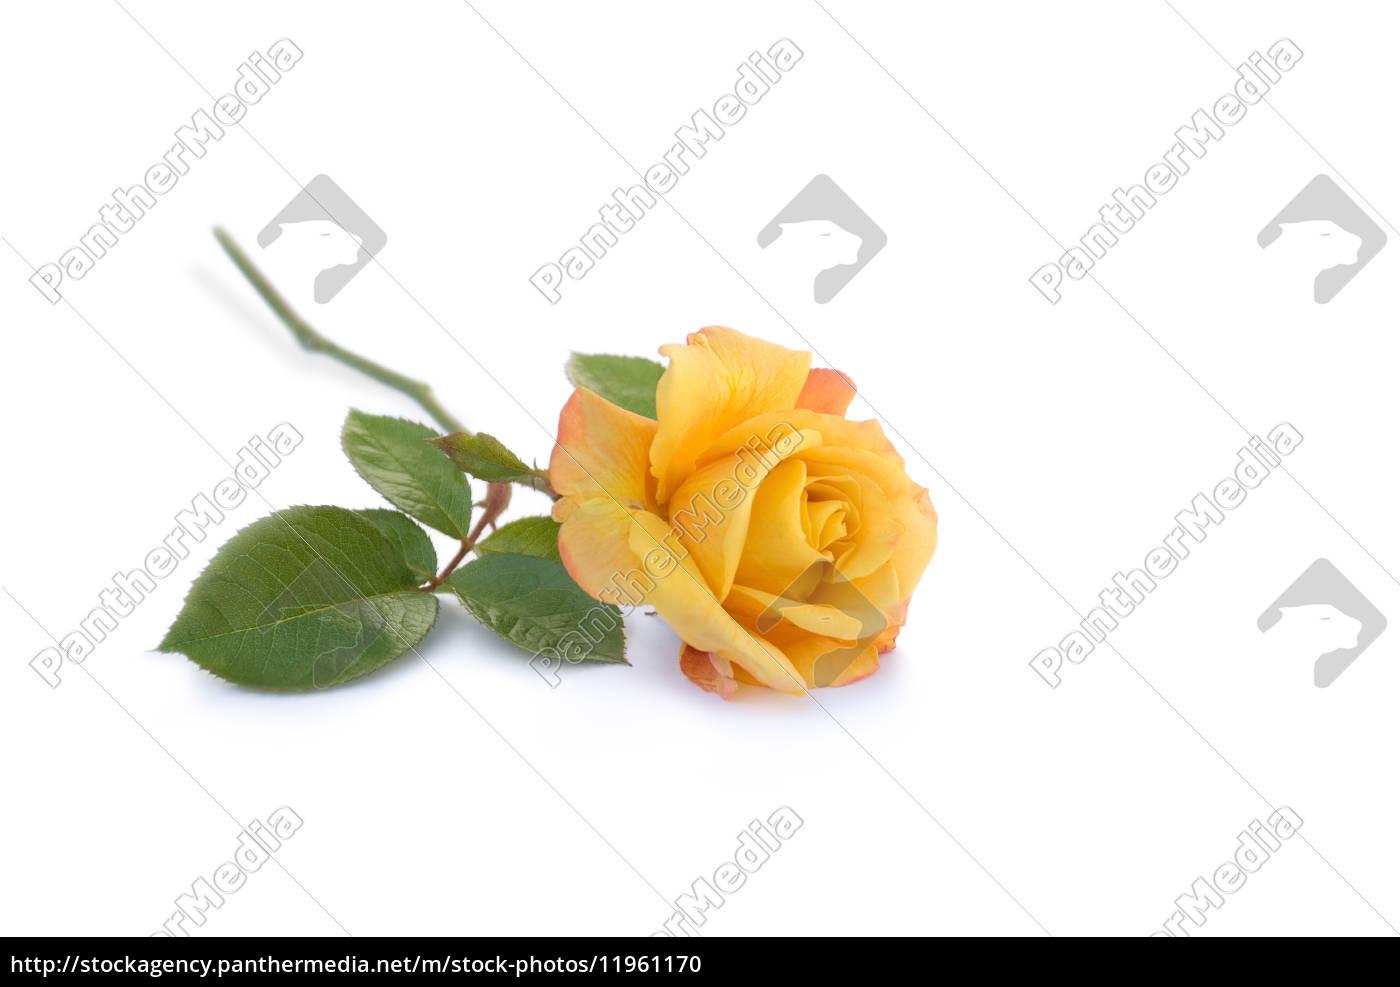 Gemeinsame Gelbe Rose - Stock Photo - #11961170 - Bildagentur PantherMedia @QO_69